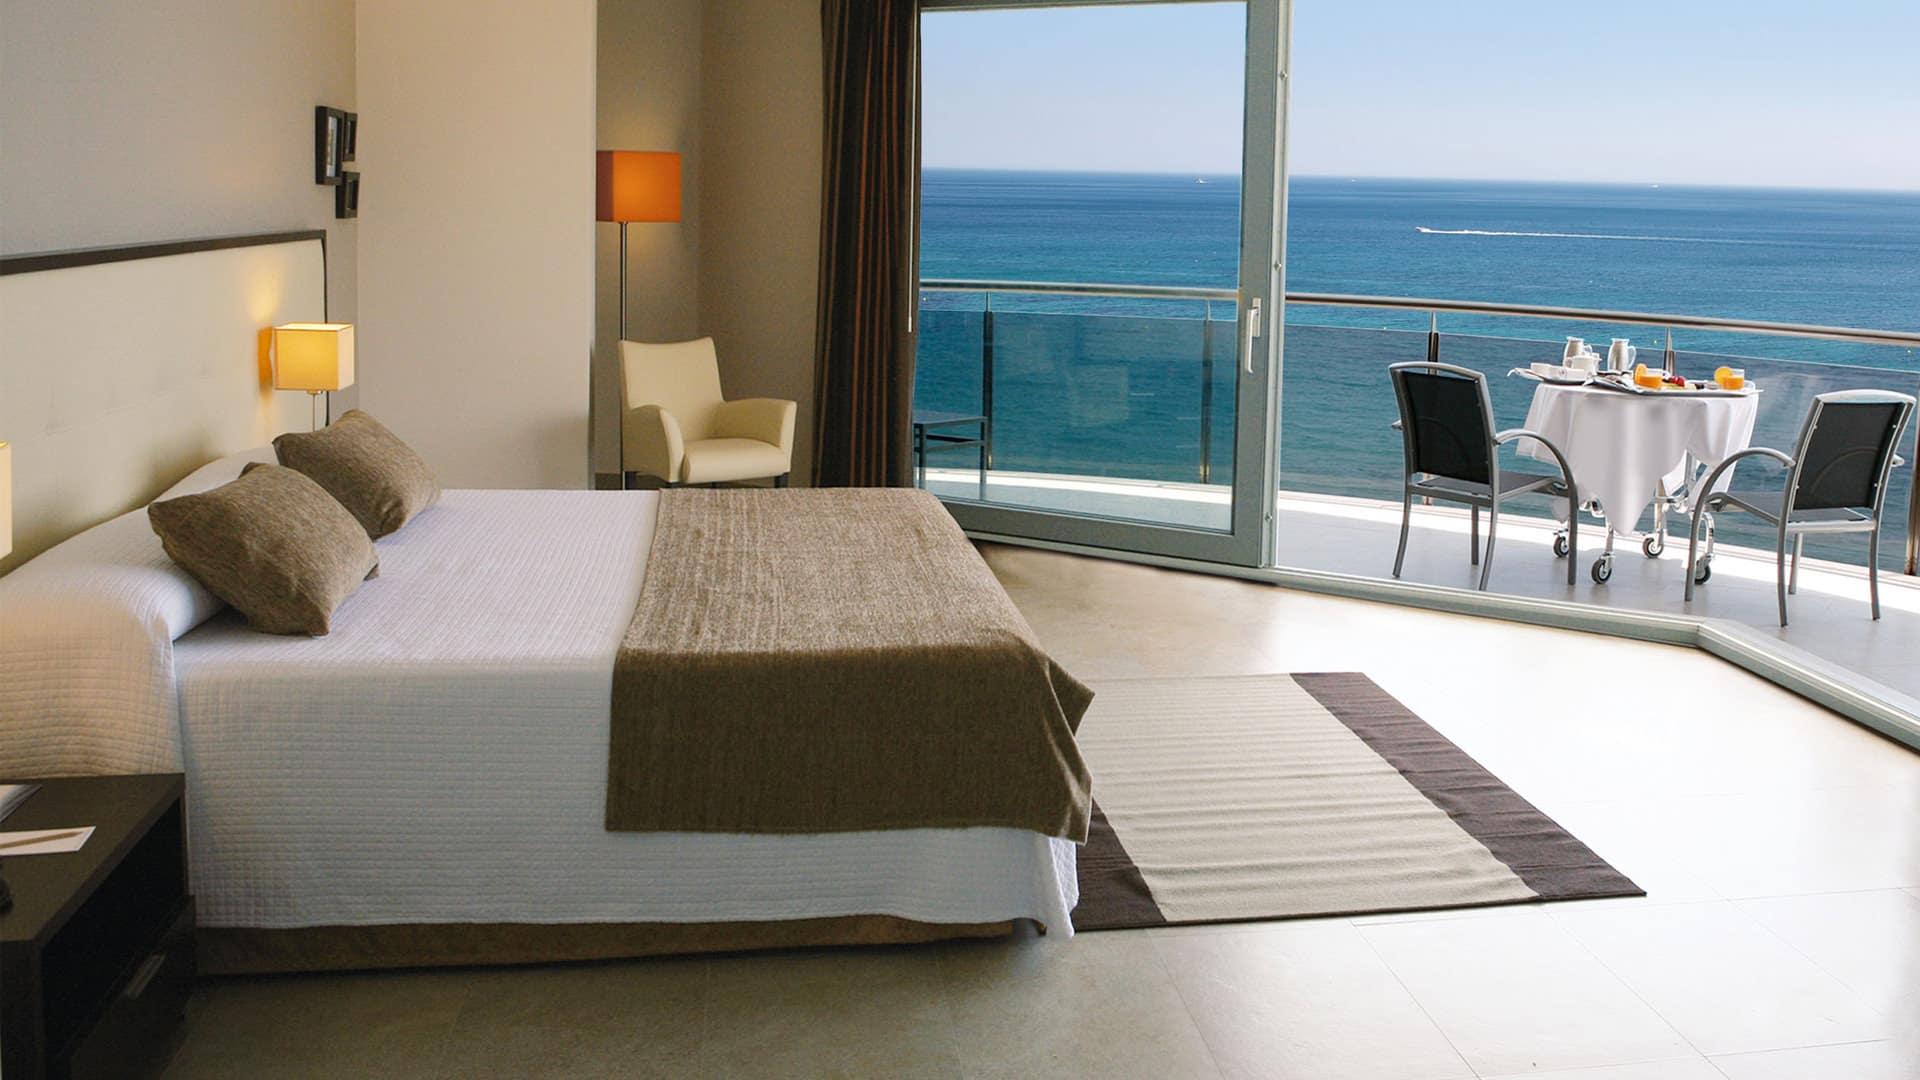 Llinatex fabricantes de art culos textiles para hosteler a - Ropa de cama para hosteleria ...